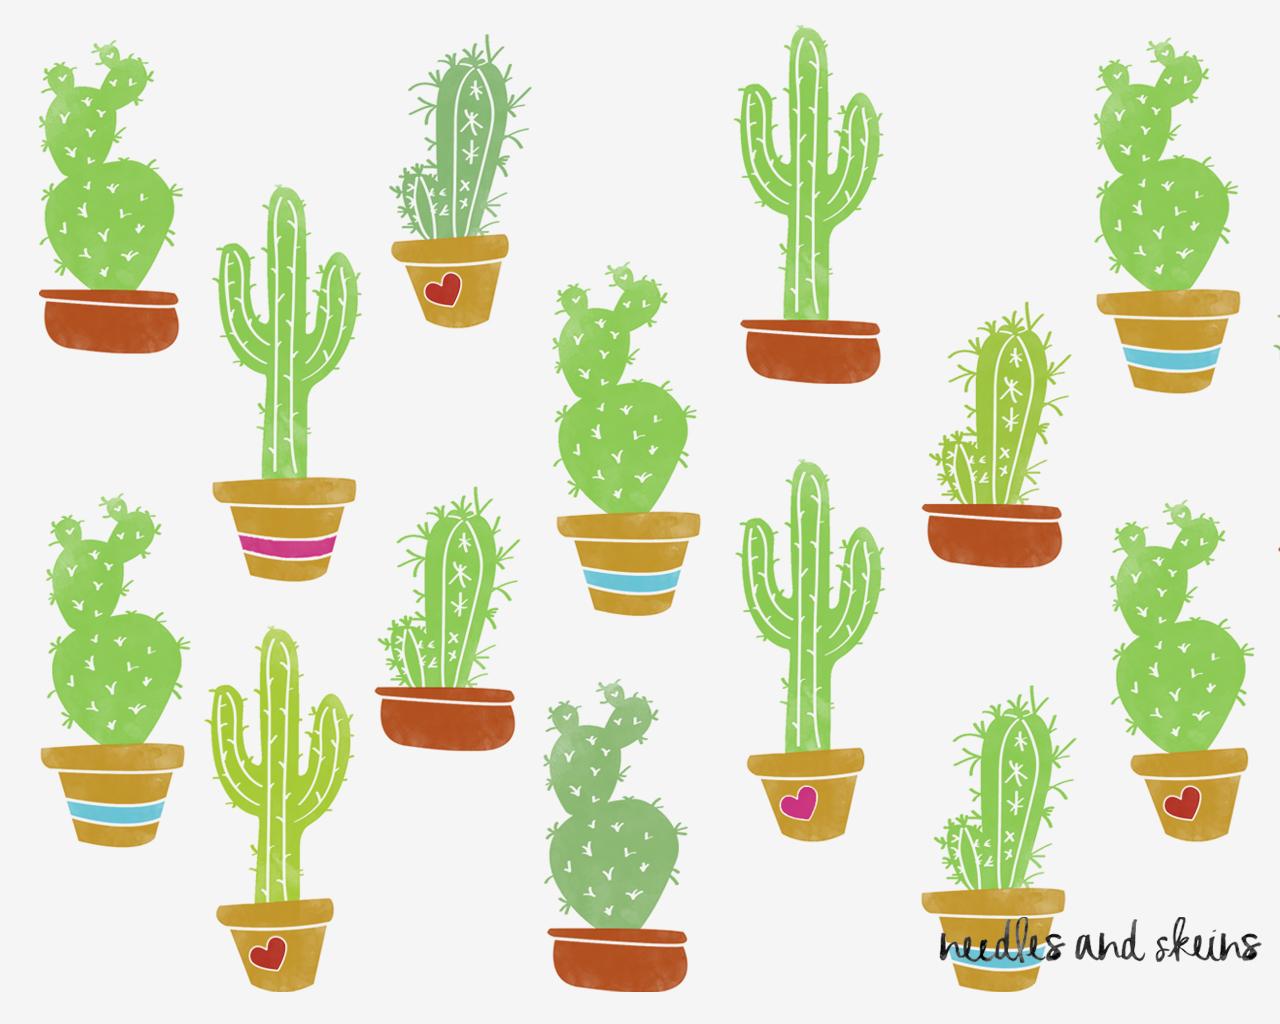 cactus wallpaper for smartphone